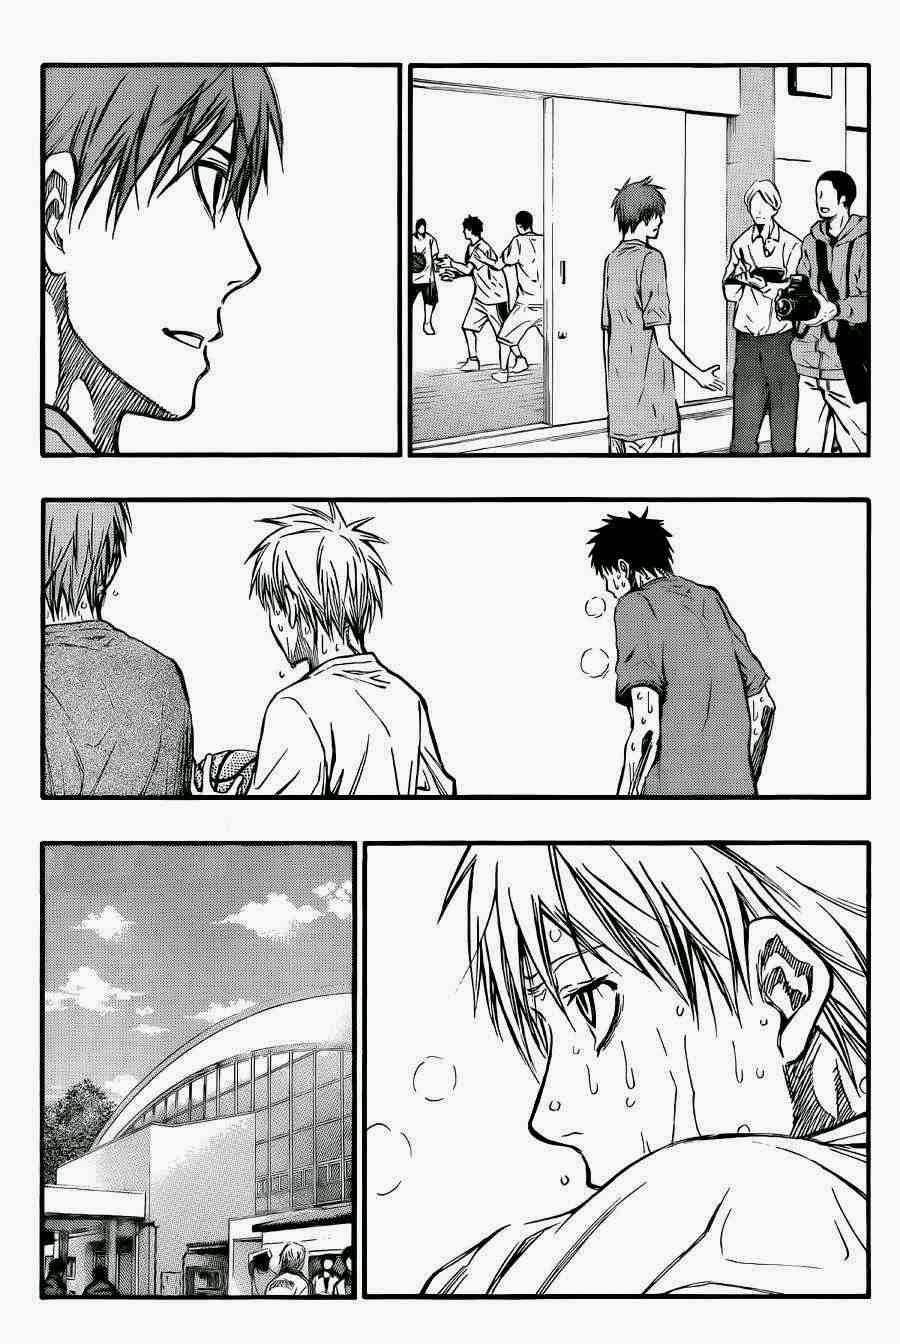 Kuroko no Basket Manga Chapter 223 - Image 07